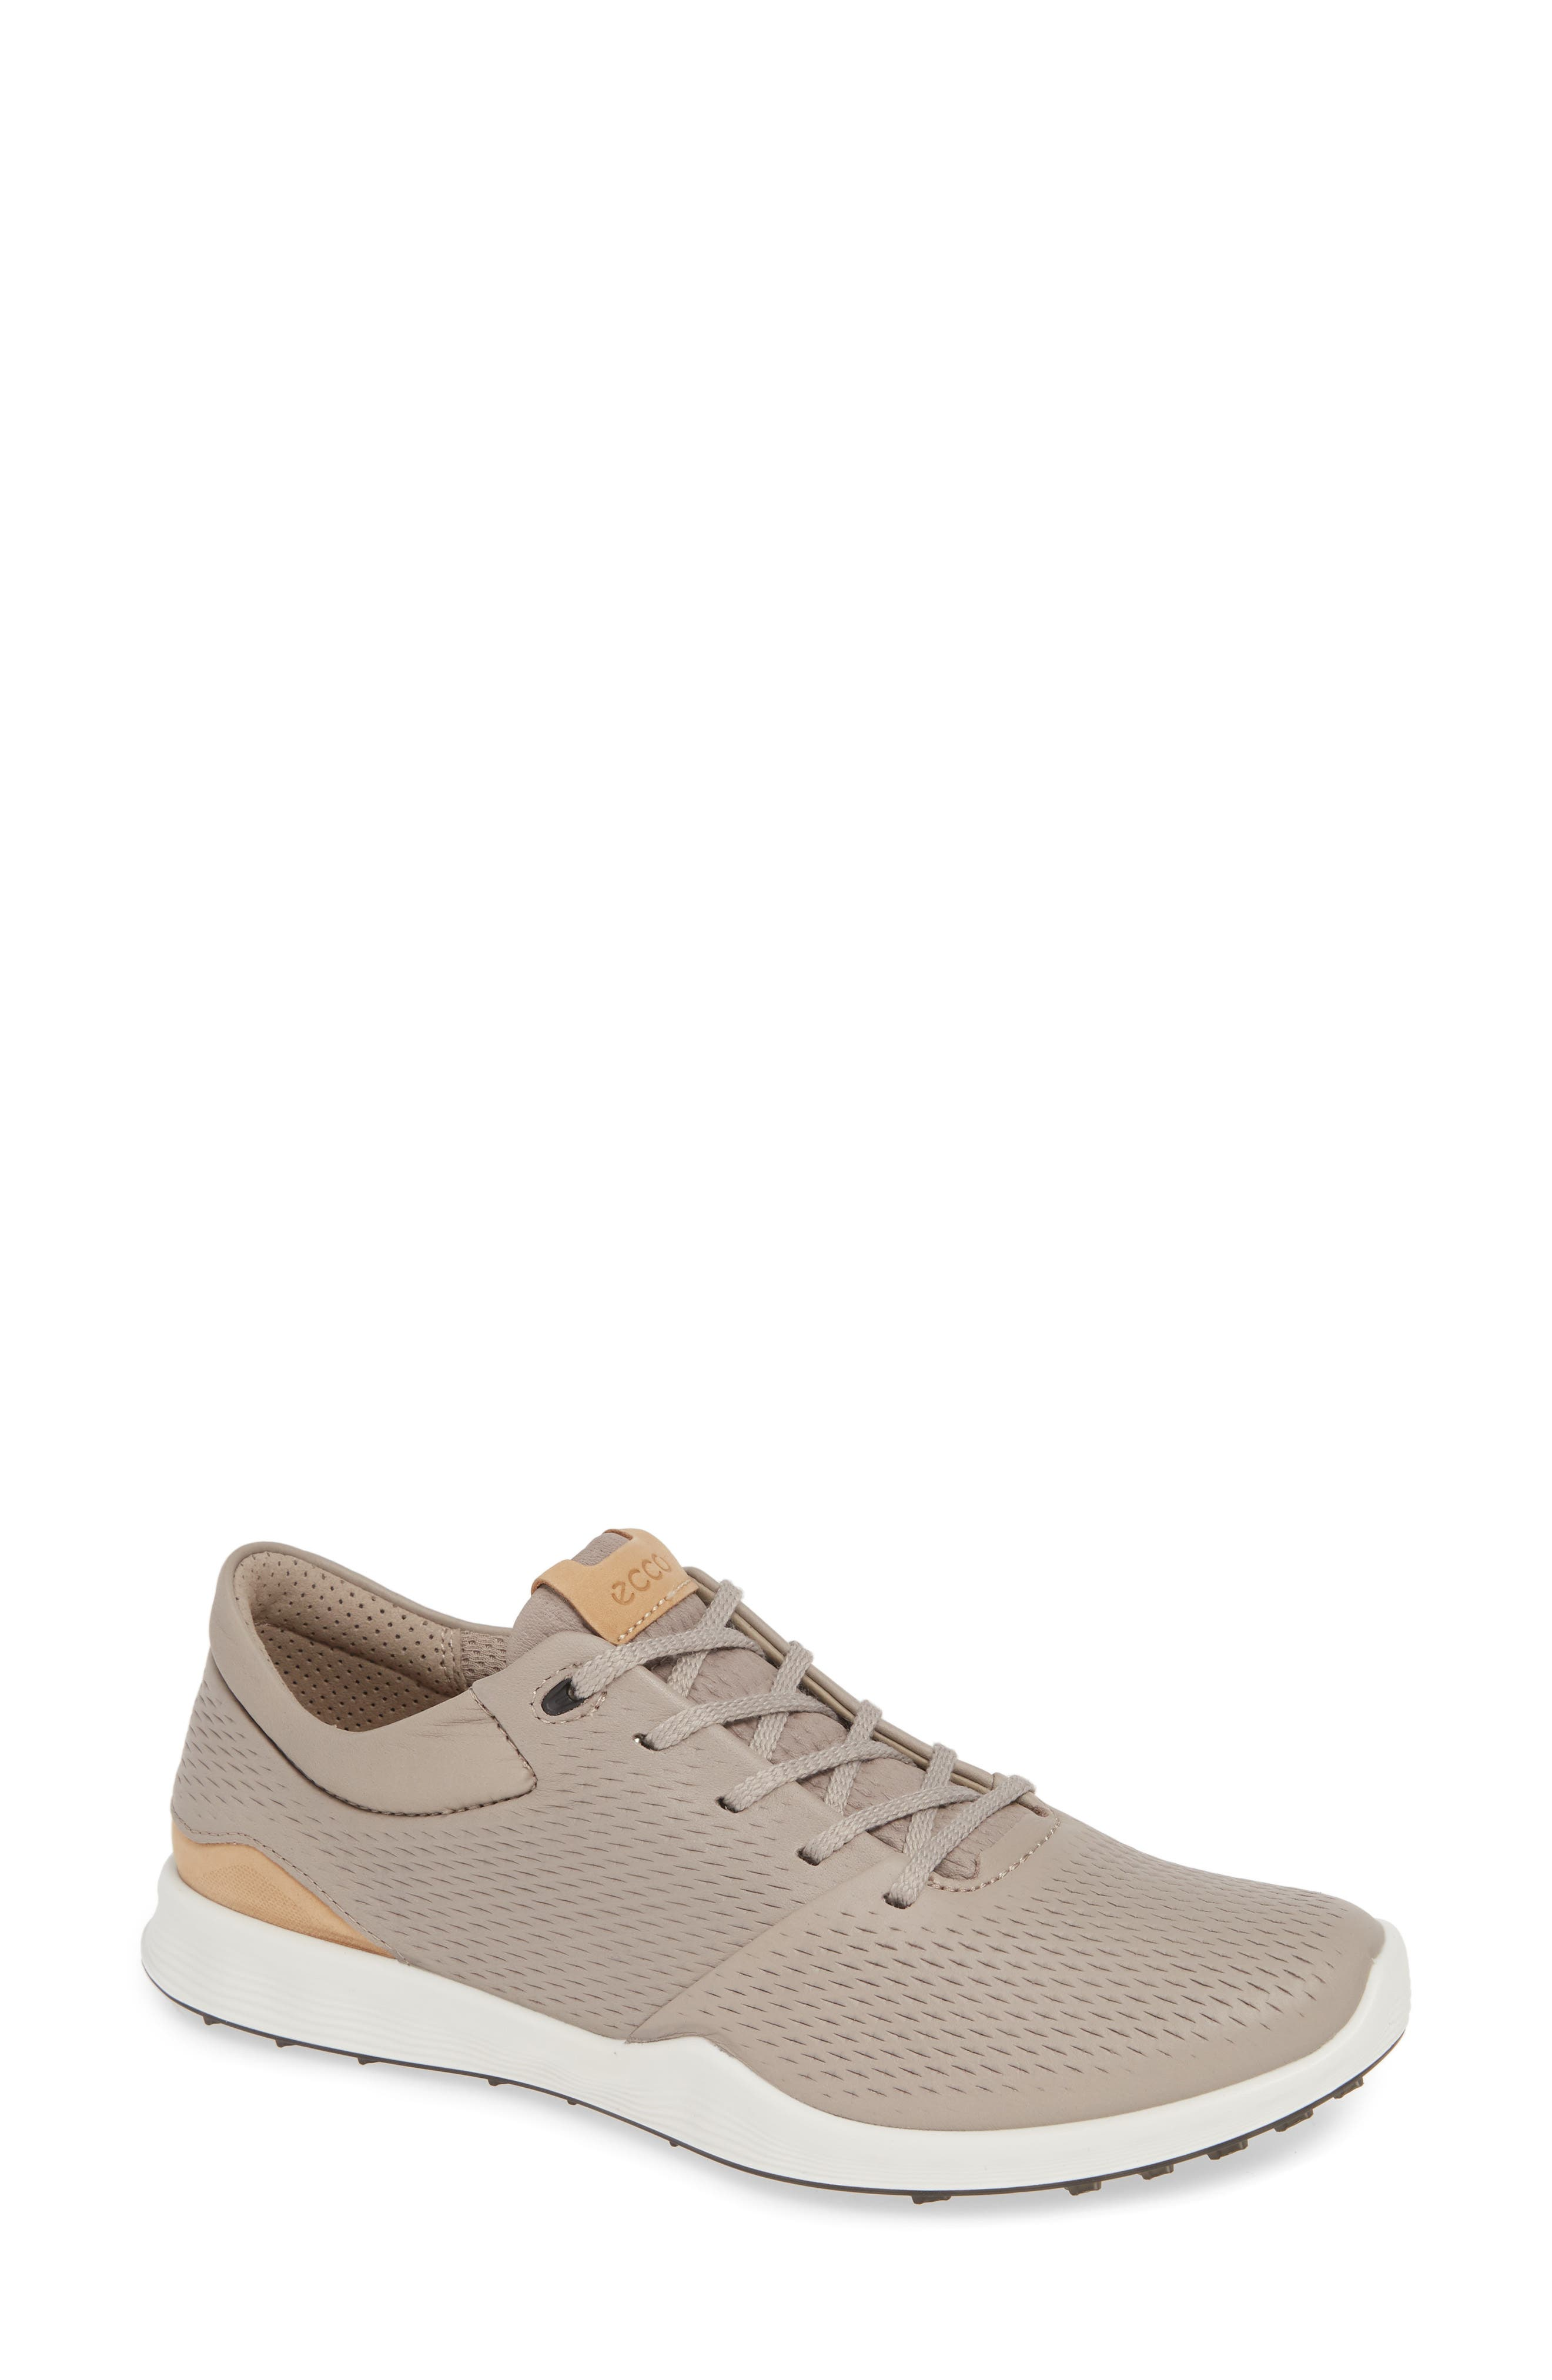 Ecco S-Lite Sneaker, Grey